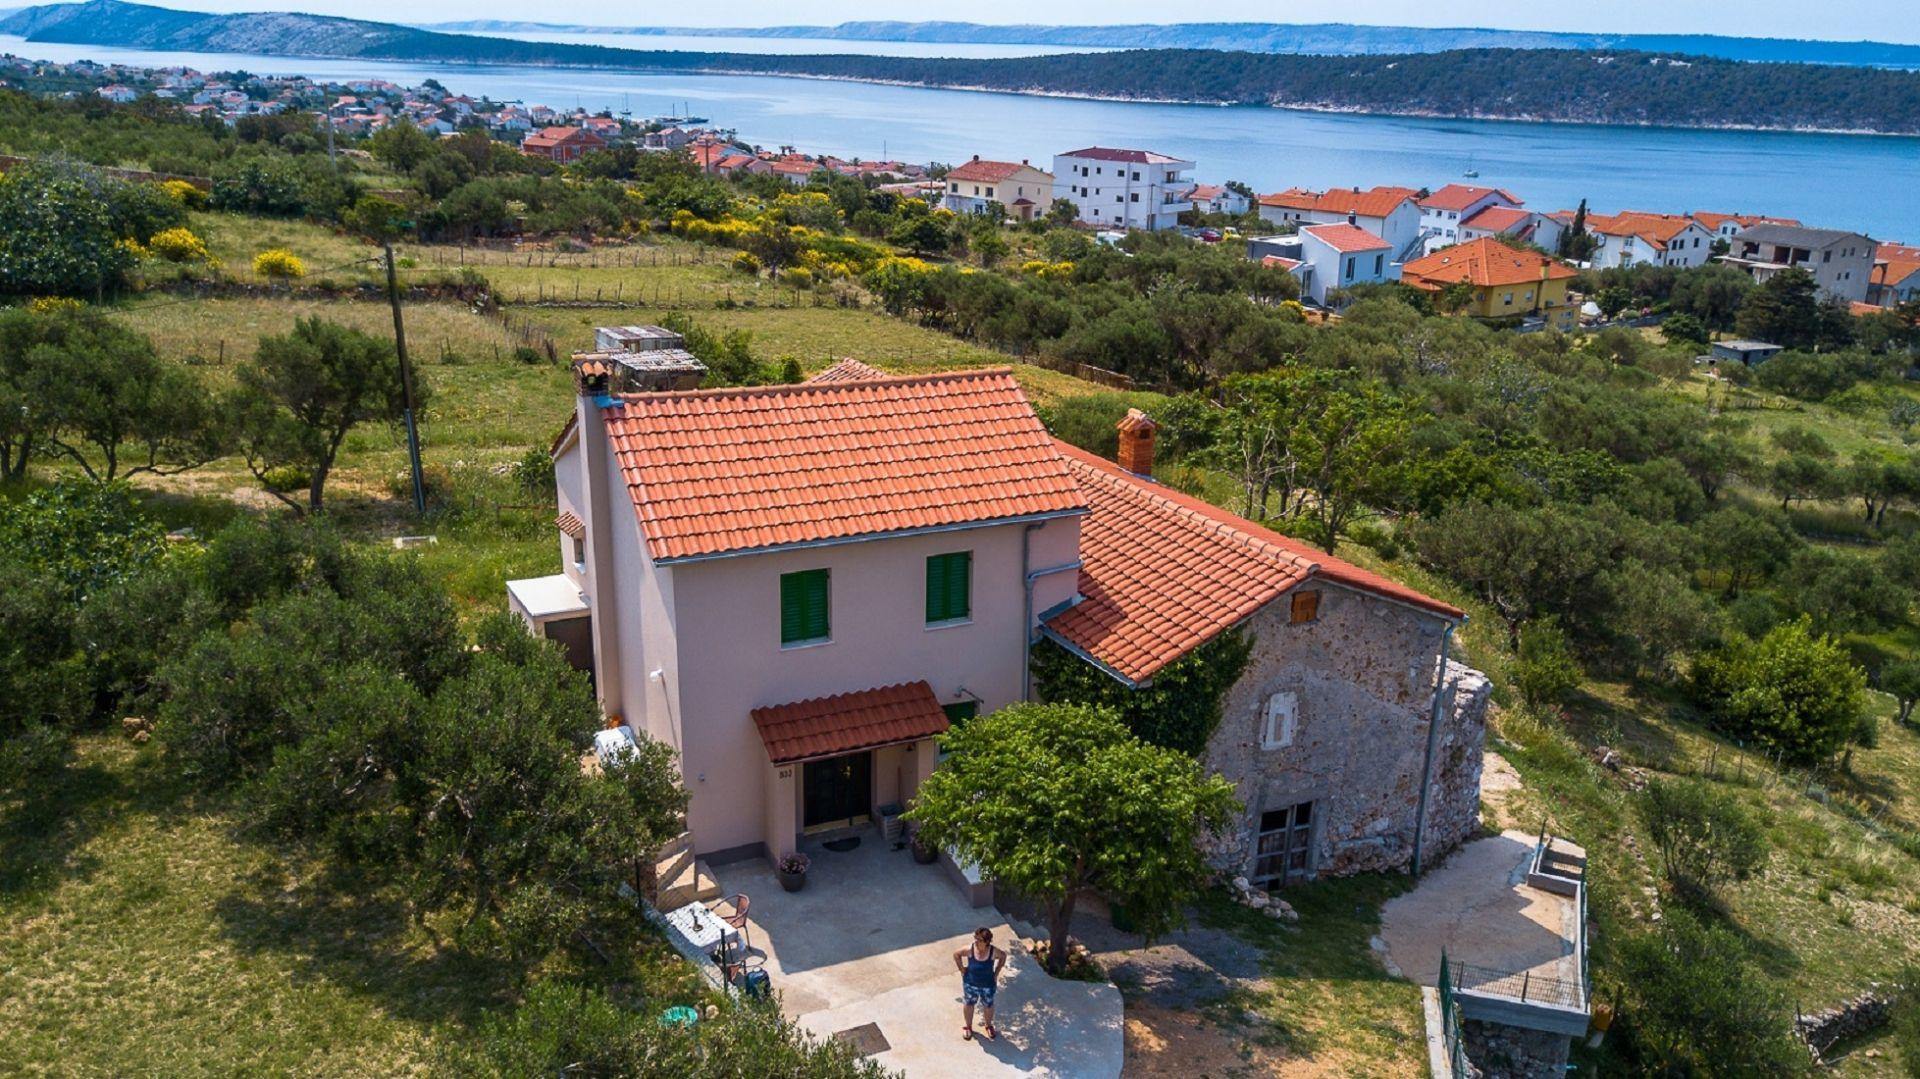 Holiday Homes, Banjole, Pula & south Istria - Holiday houses, villas  Anđeli - nice and comfortable house :